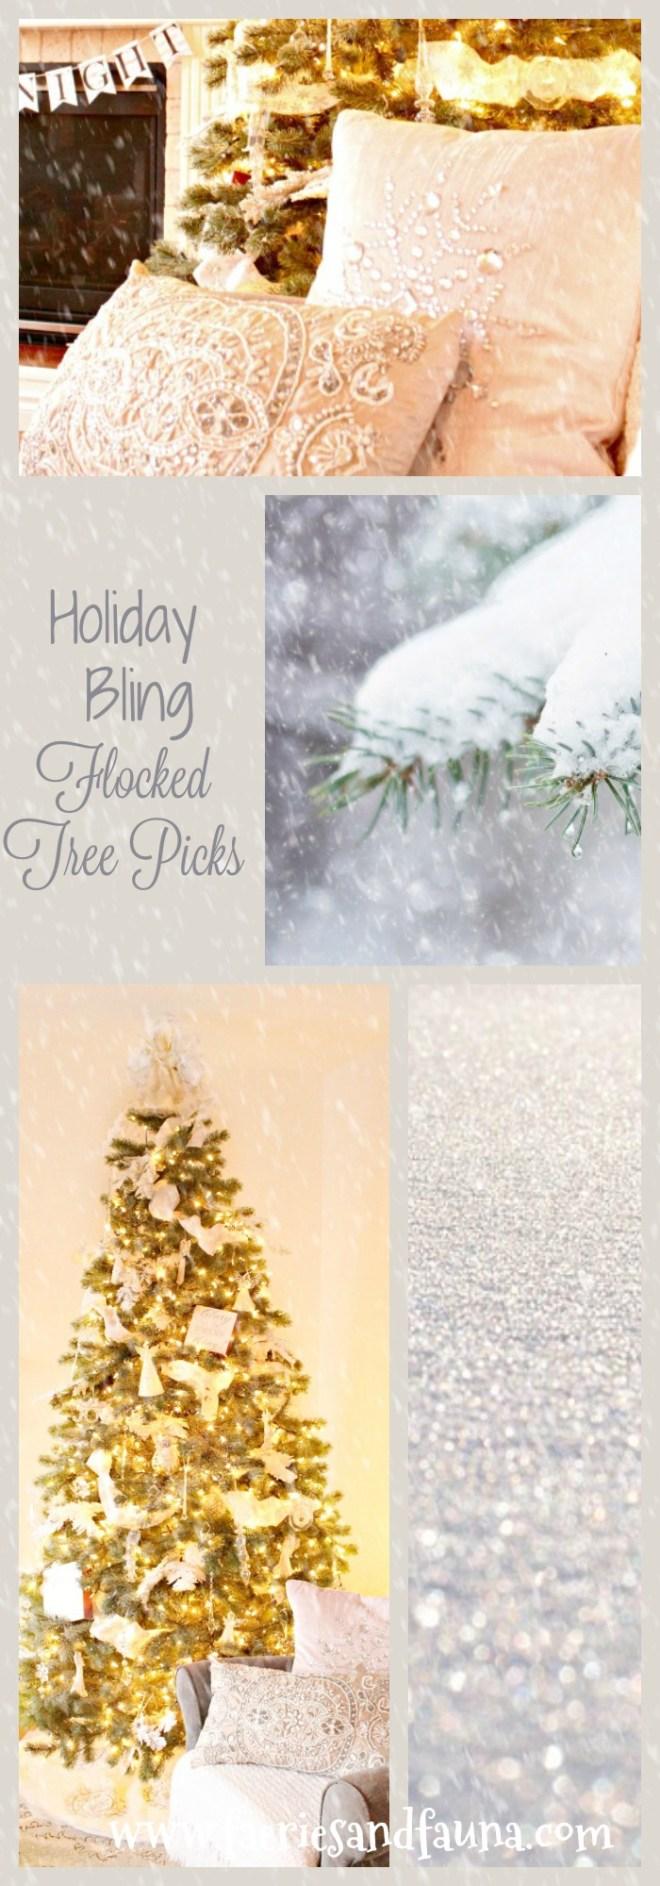 pinterest-holiday-bling